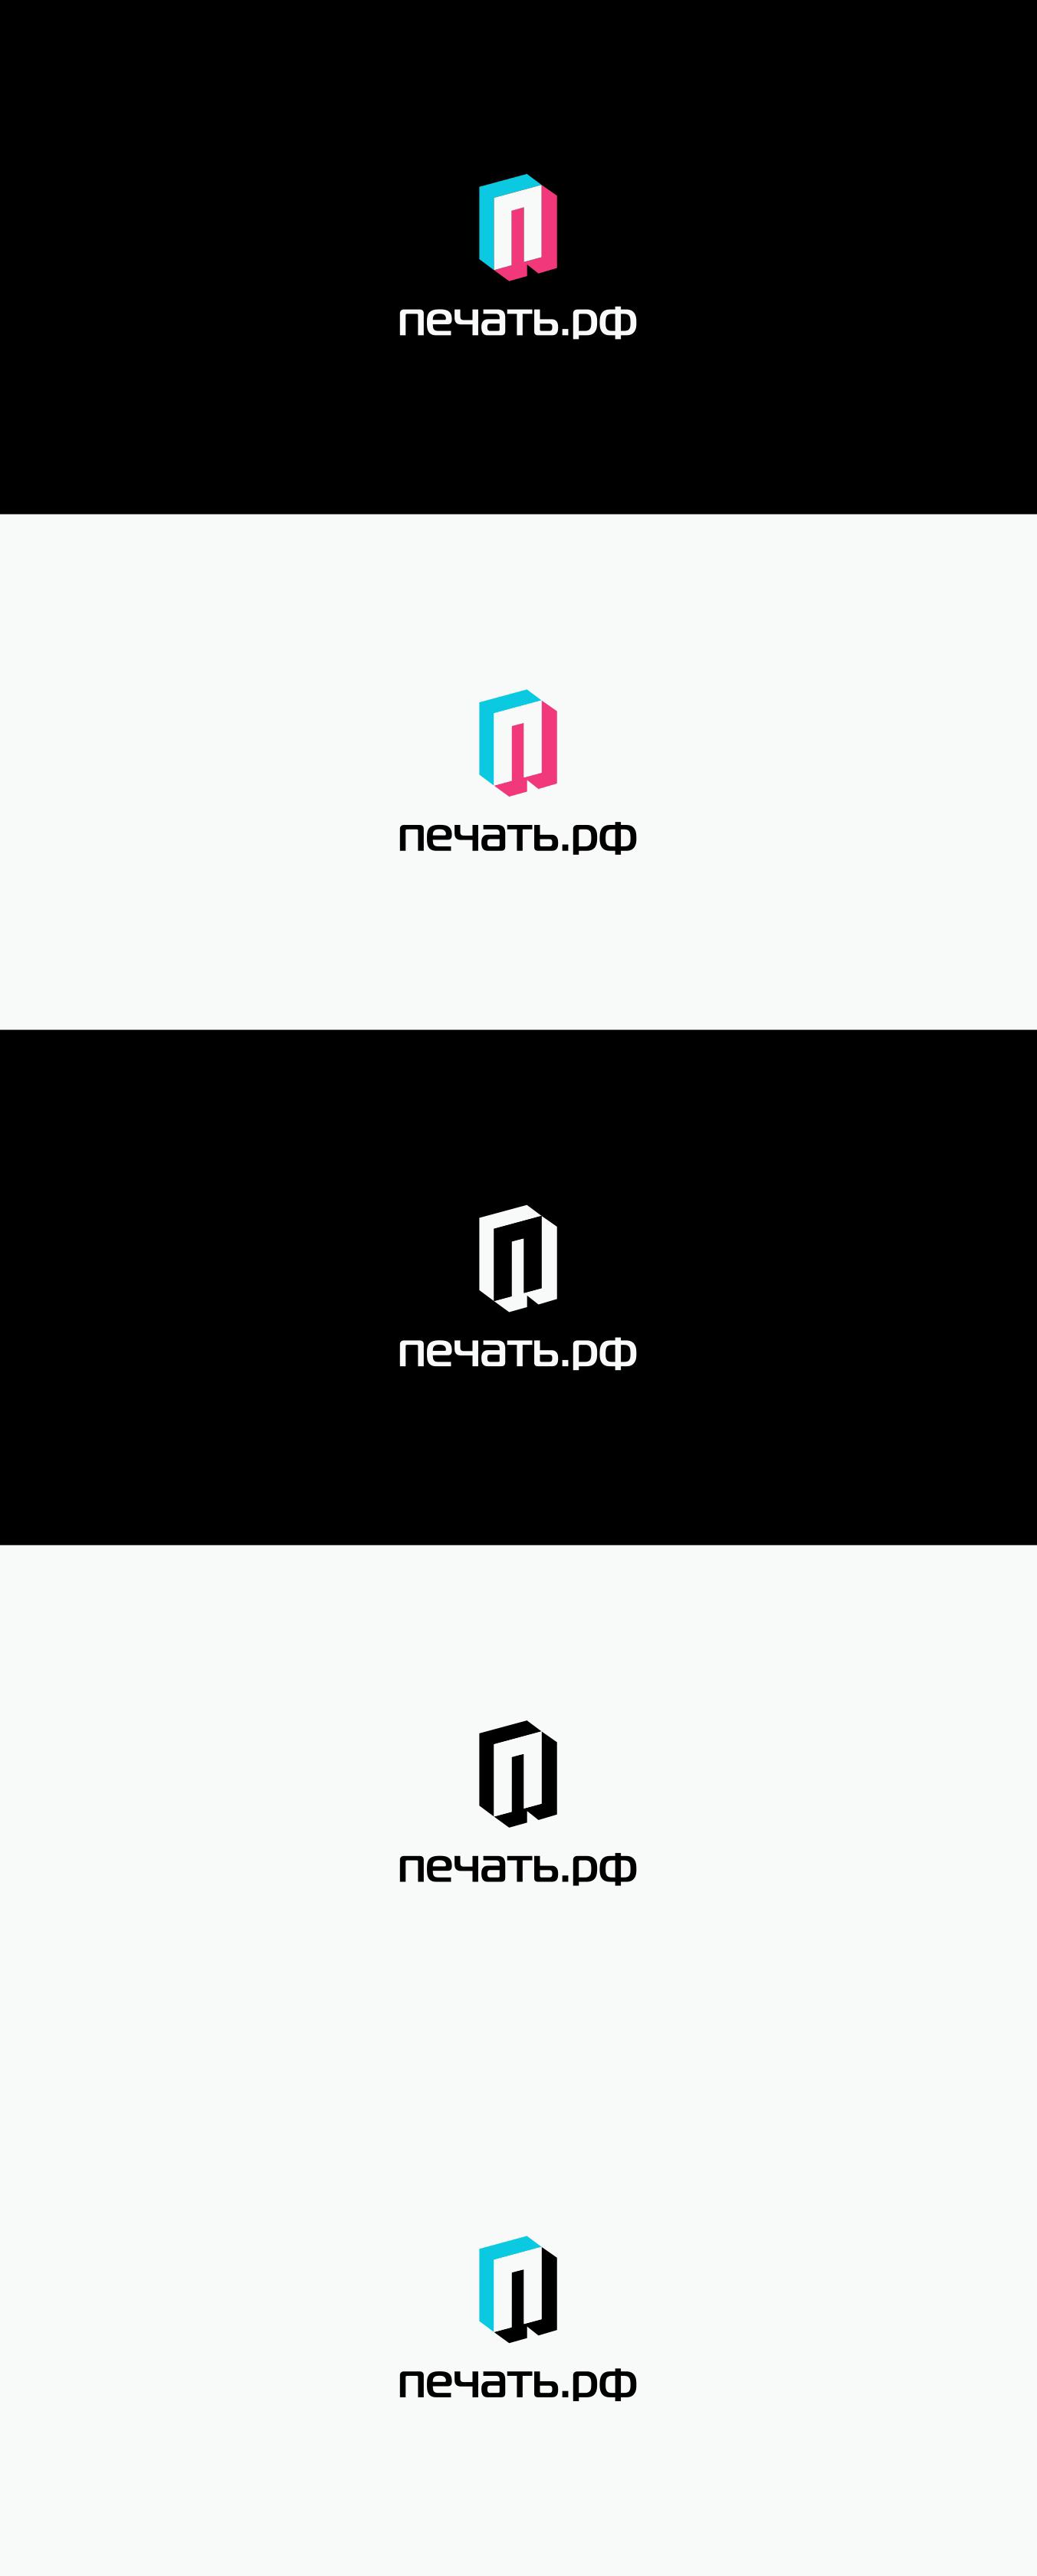 Логотип для веб-сервиса интерьерной печати и оперативной пол фото f_5825d2f064010d74.jpg